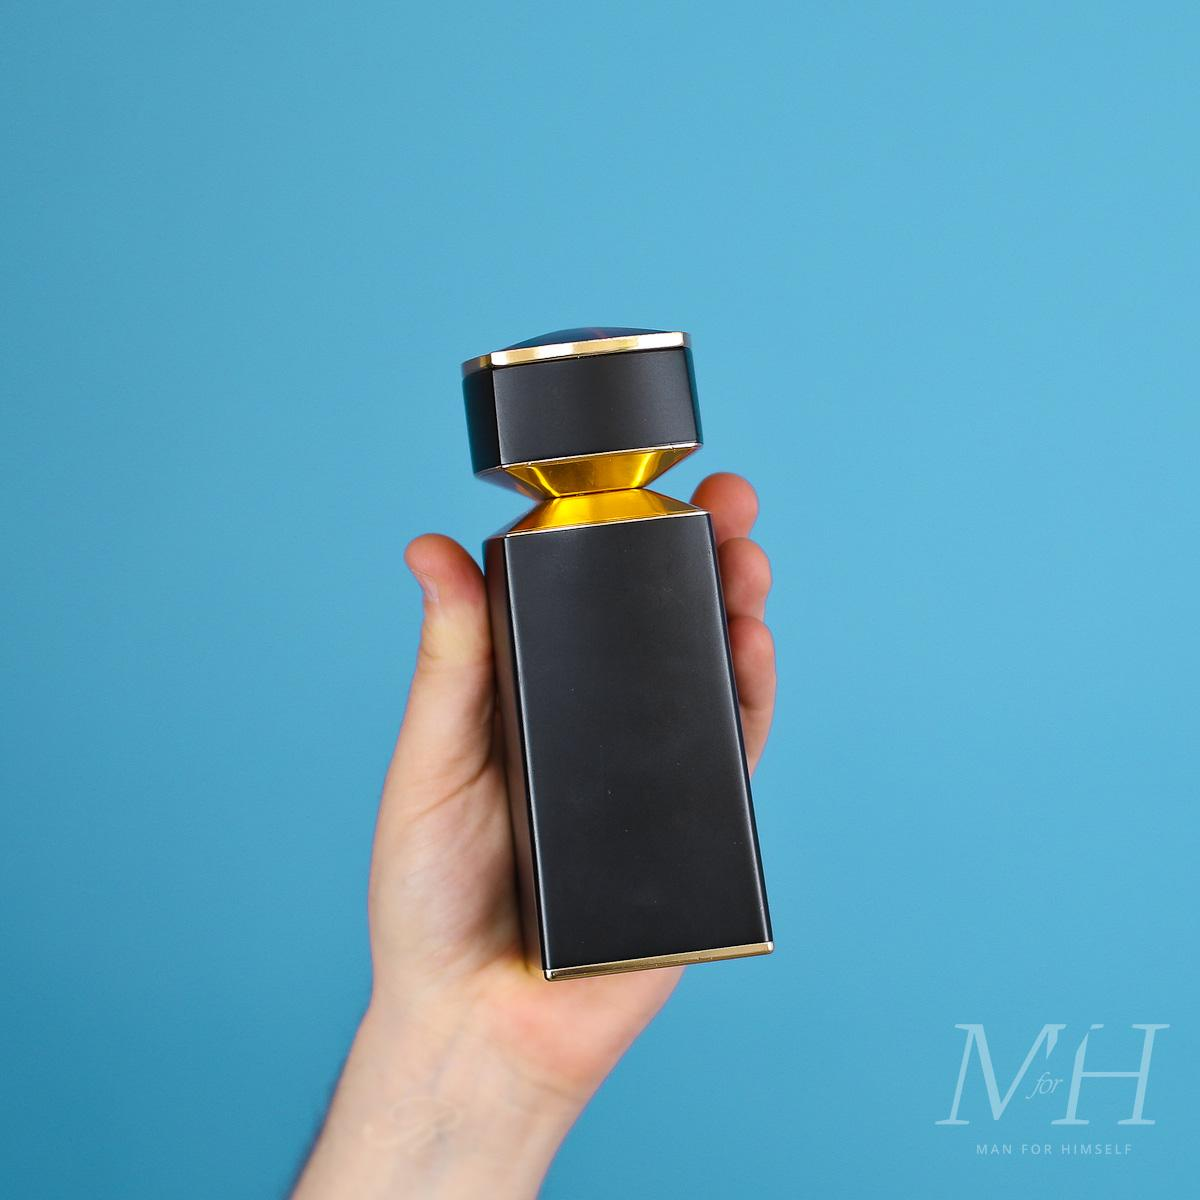 bvlgari-tygar-fragrance-product-review-man-for-himself